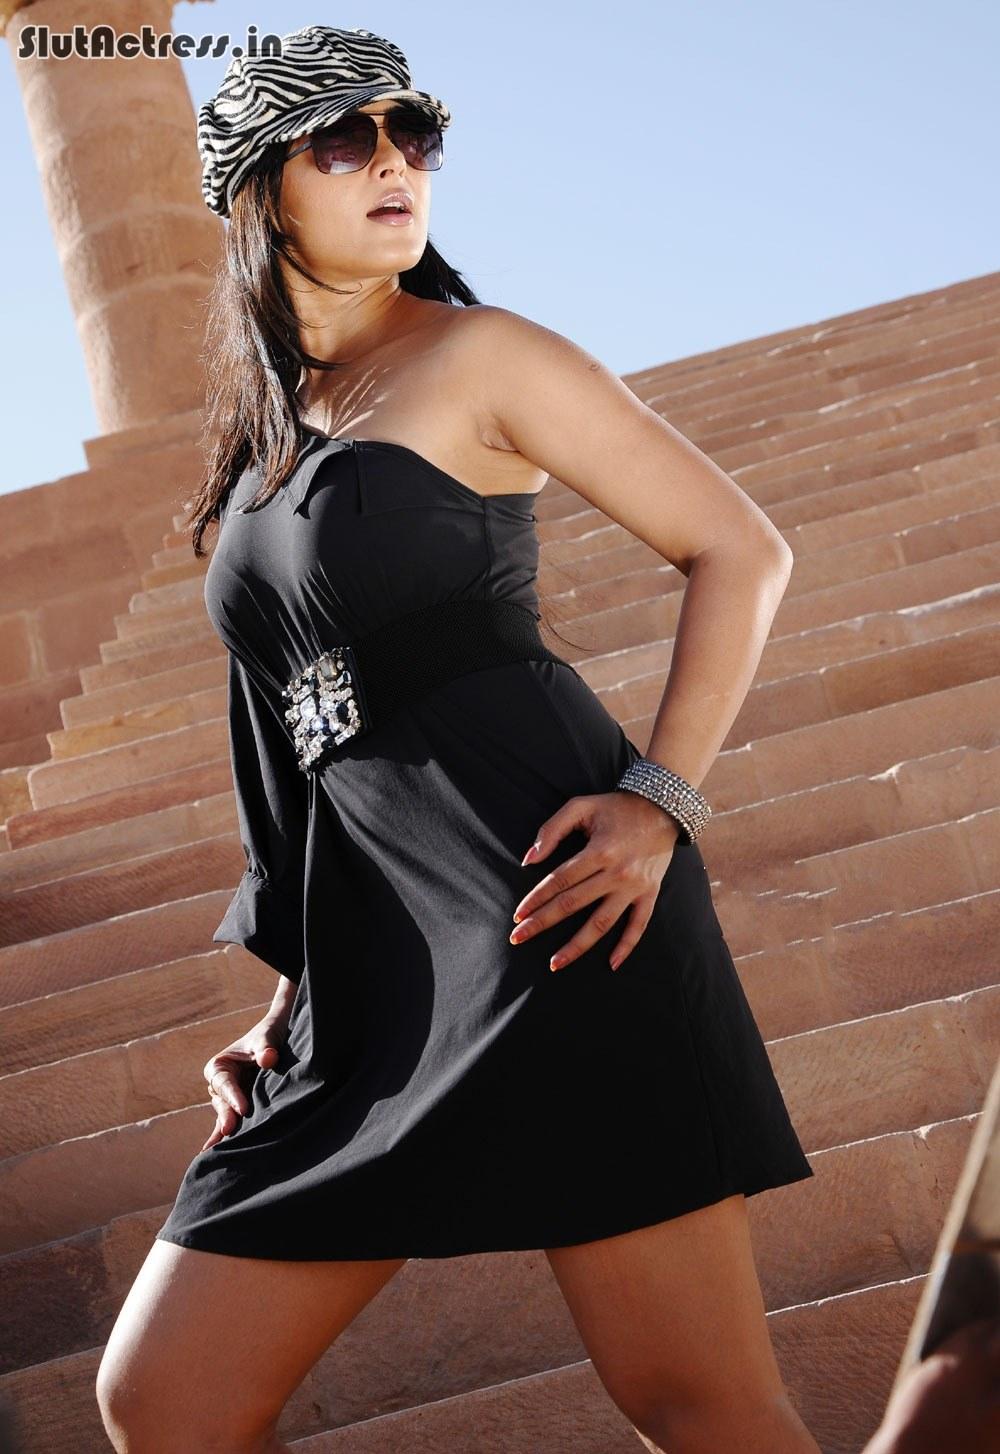 anushka shetty hot bra impression show from tight dress